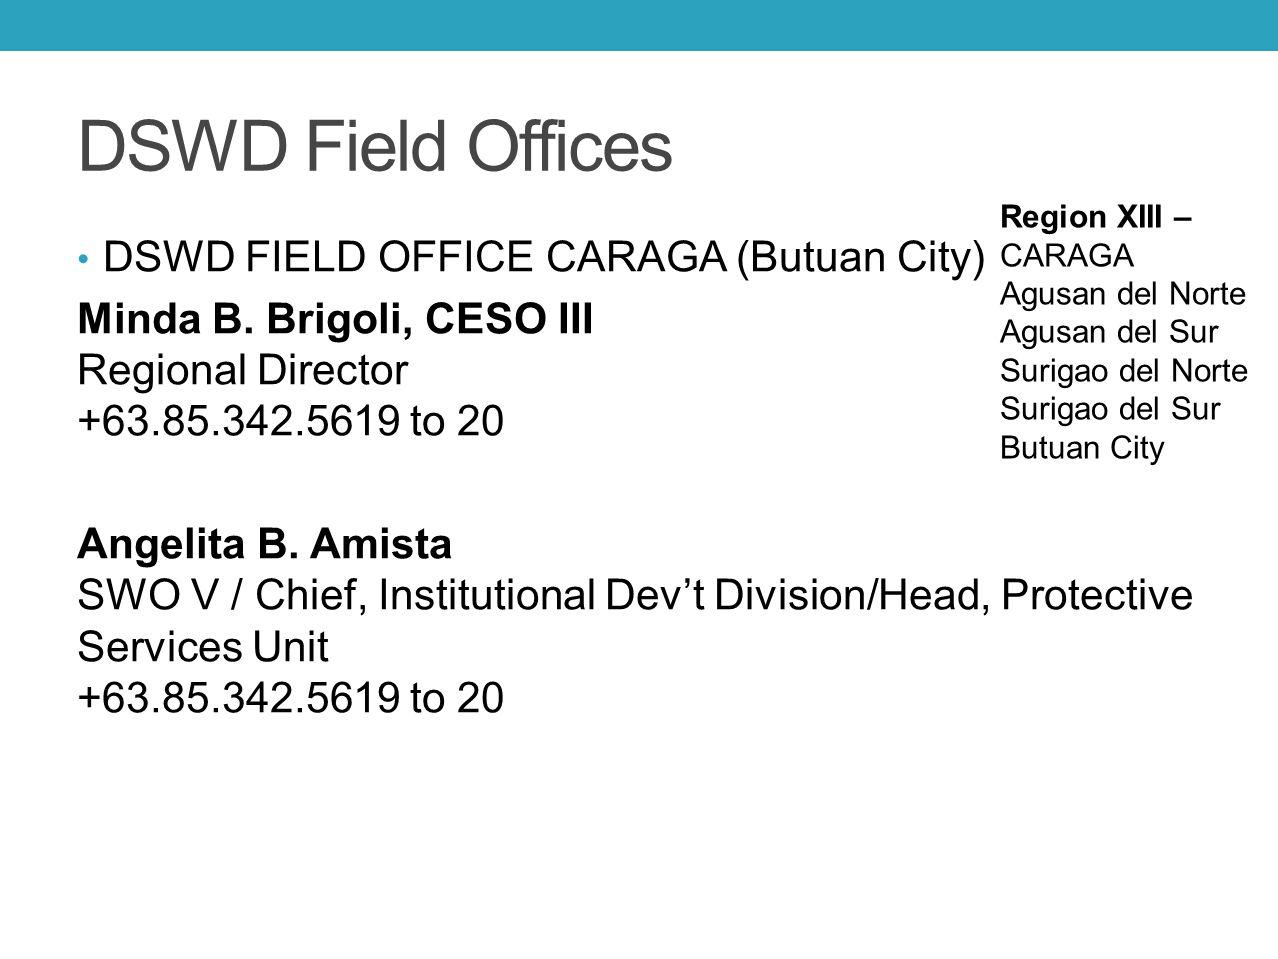 DSWD Field Offices DSWD FIELD OFFICE CARAGA (Butuan City) Minda B. Brigoli, CESO III Regional Director +63.85.342.5619 to 20 Angelita B. Amista SWO V